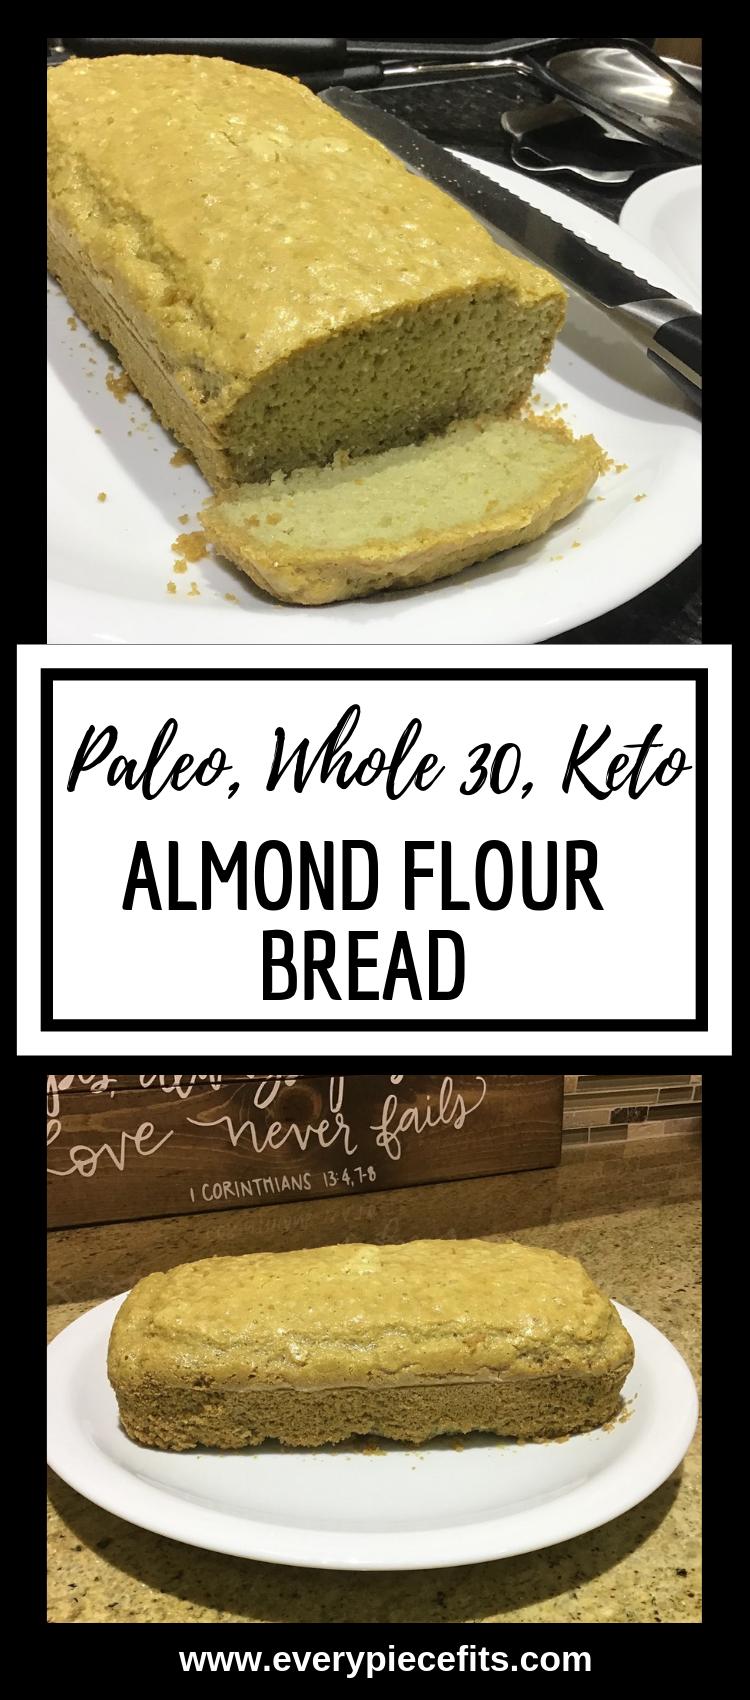 Paleo Whole 30 Keto Almond Flour Bread.png